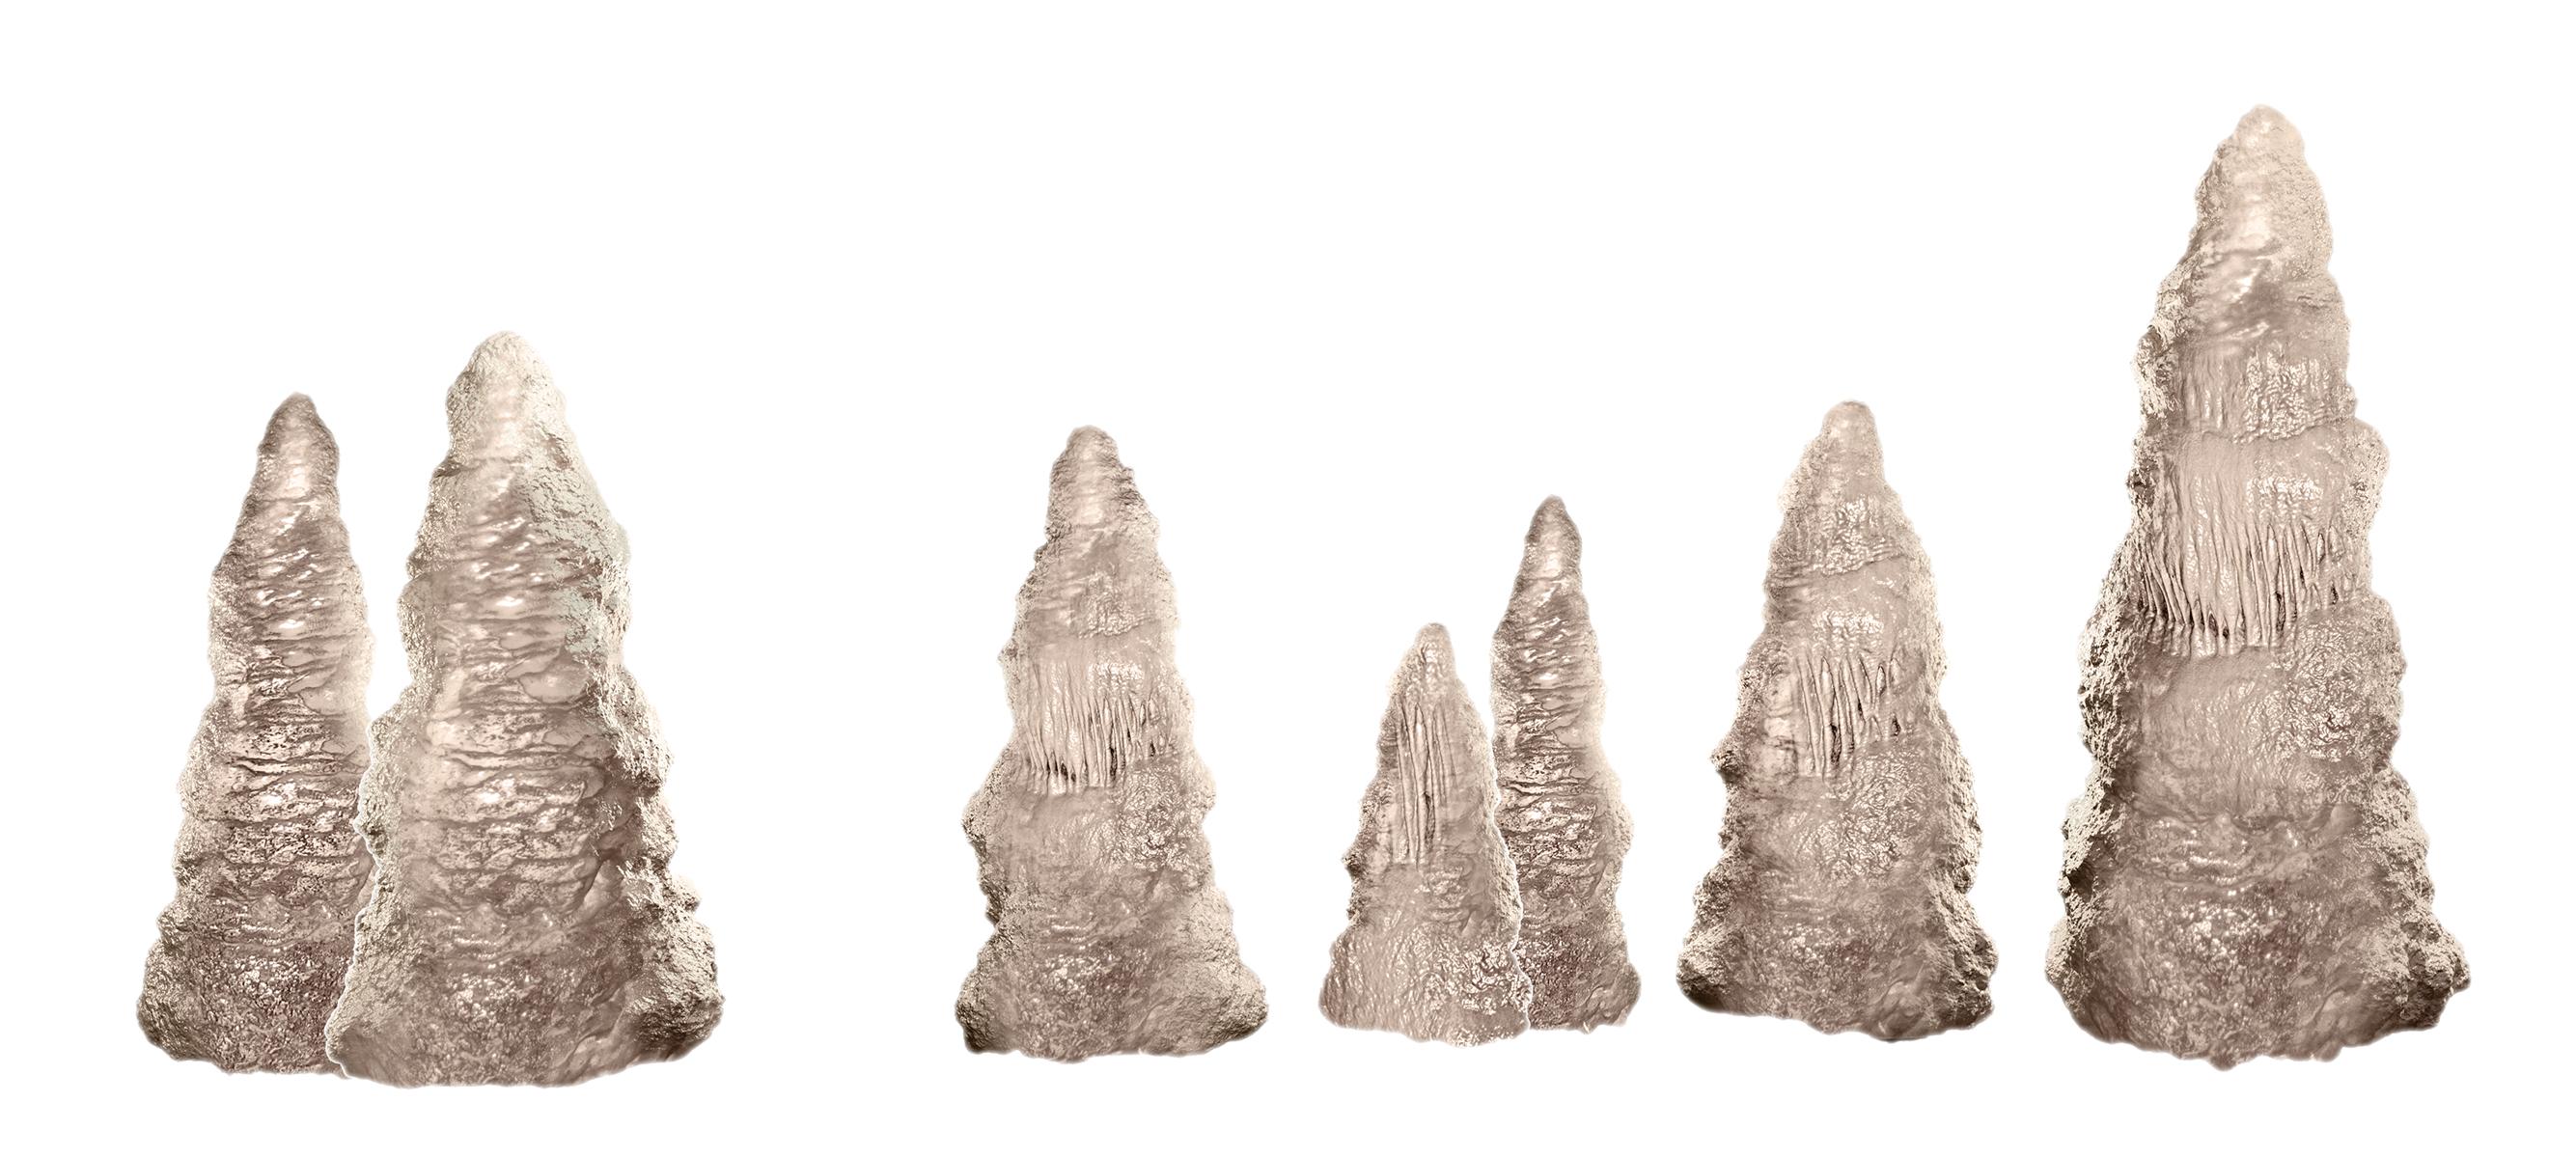 Cavern clipart stalagmite Tools & Stalagmite Cliparts Zone